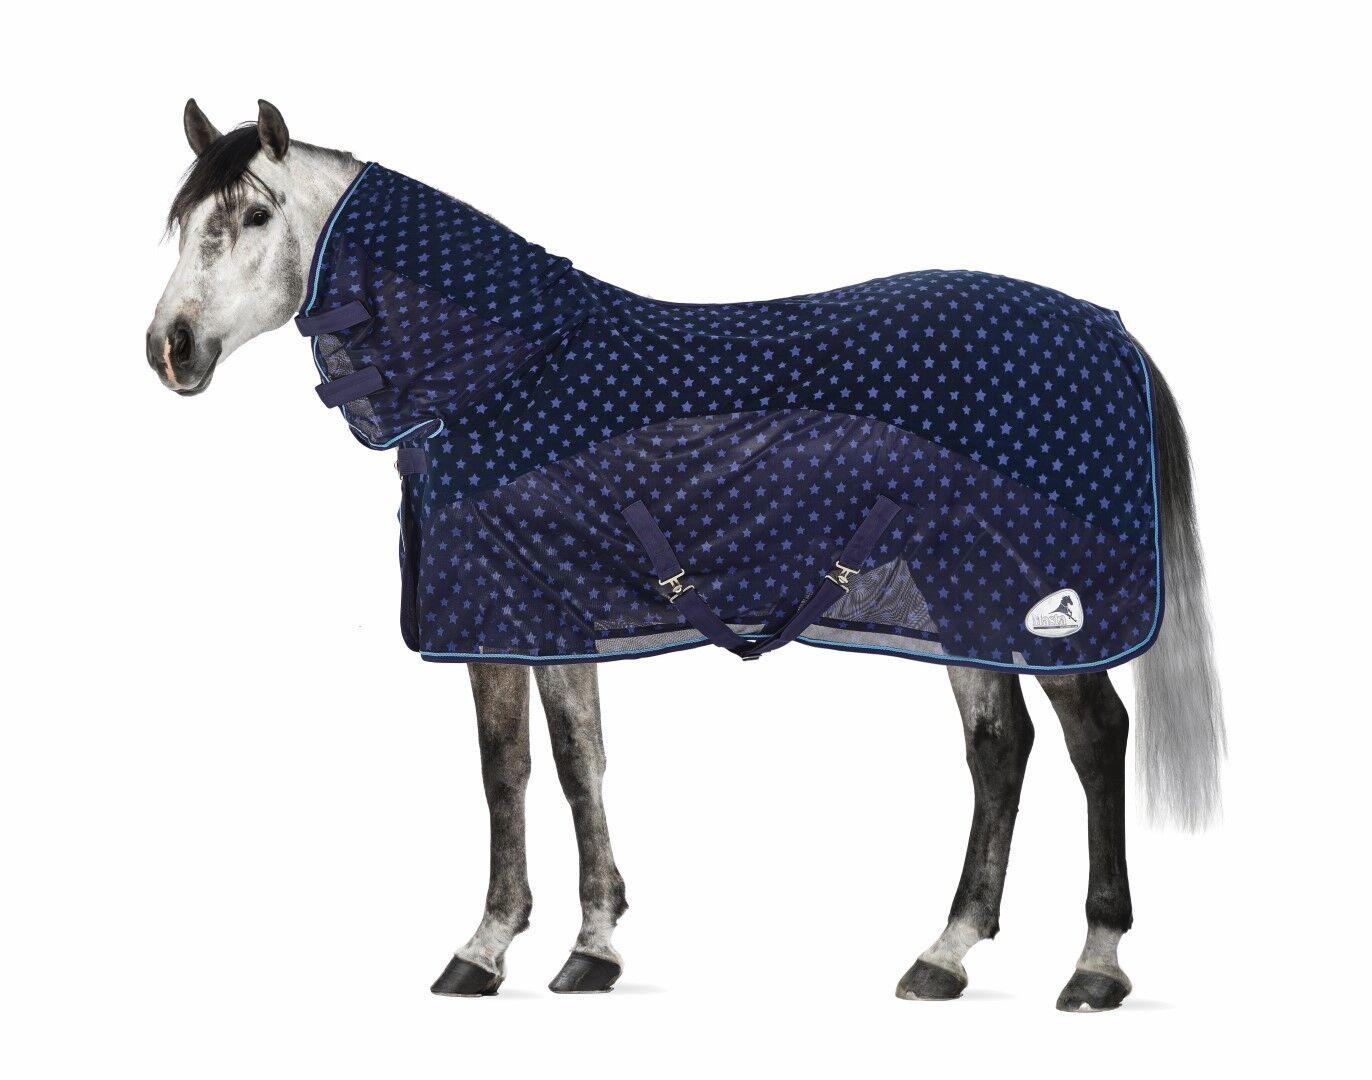 Masta Fleece Fleece Fleece and Mesh Rug, Cooler, Travel Rug. bfa532